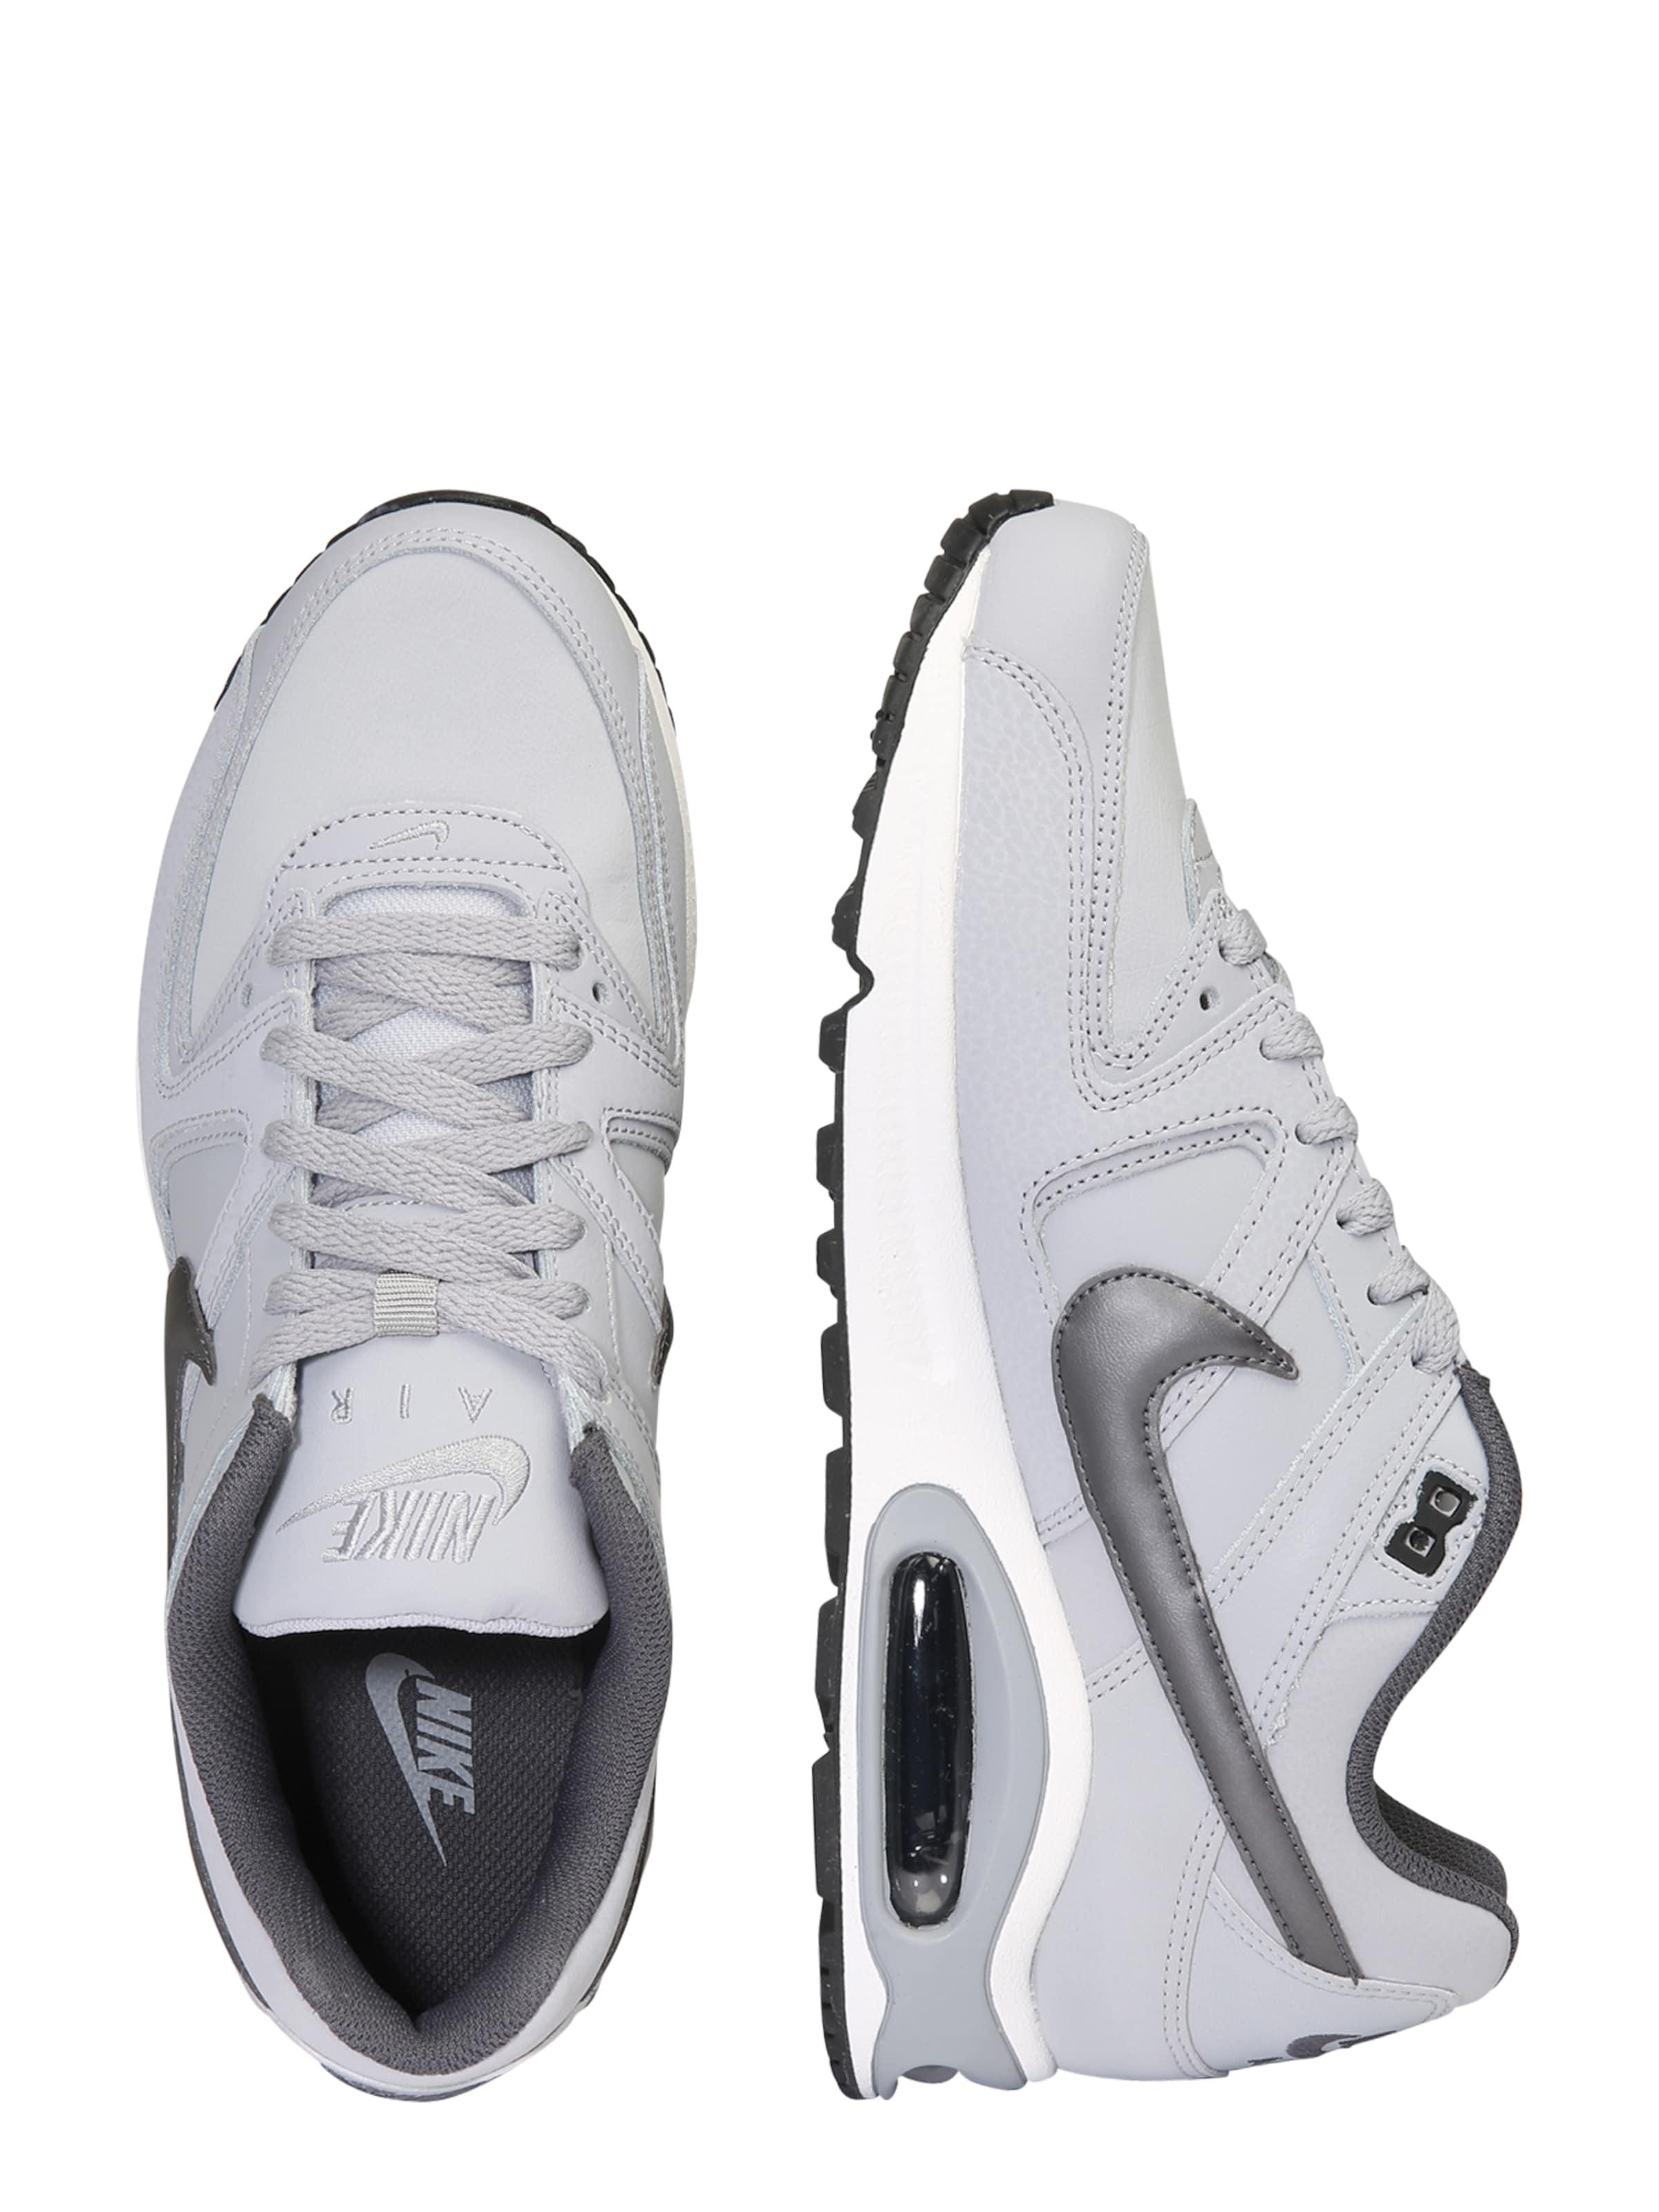 In Sneaker Command' Sportswear 'air Nike Max HellgrauDunkelgrau QdxerWBCoE